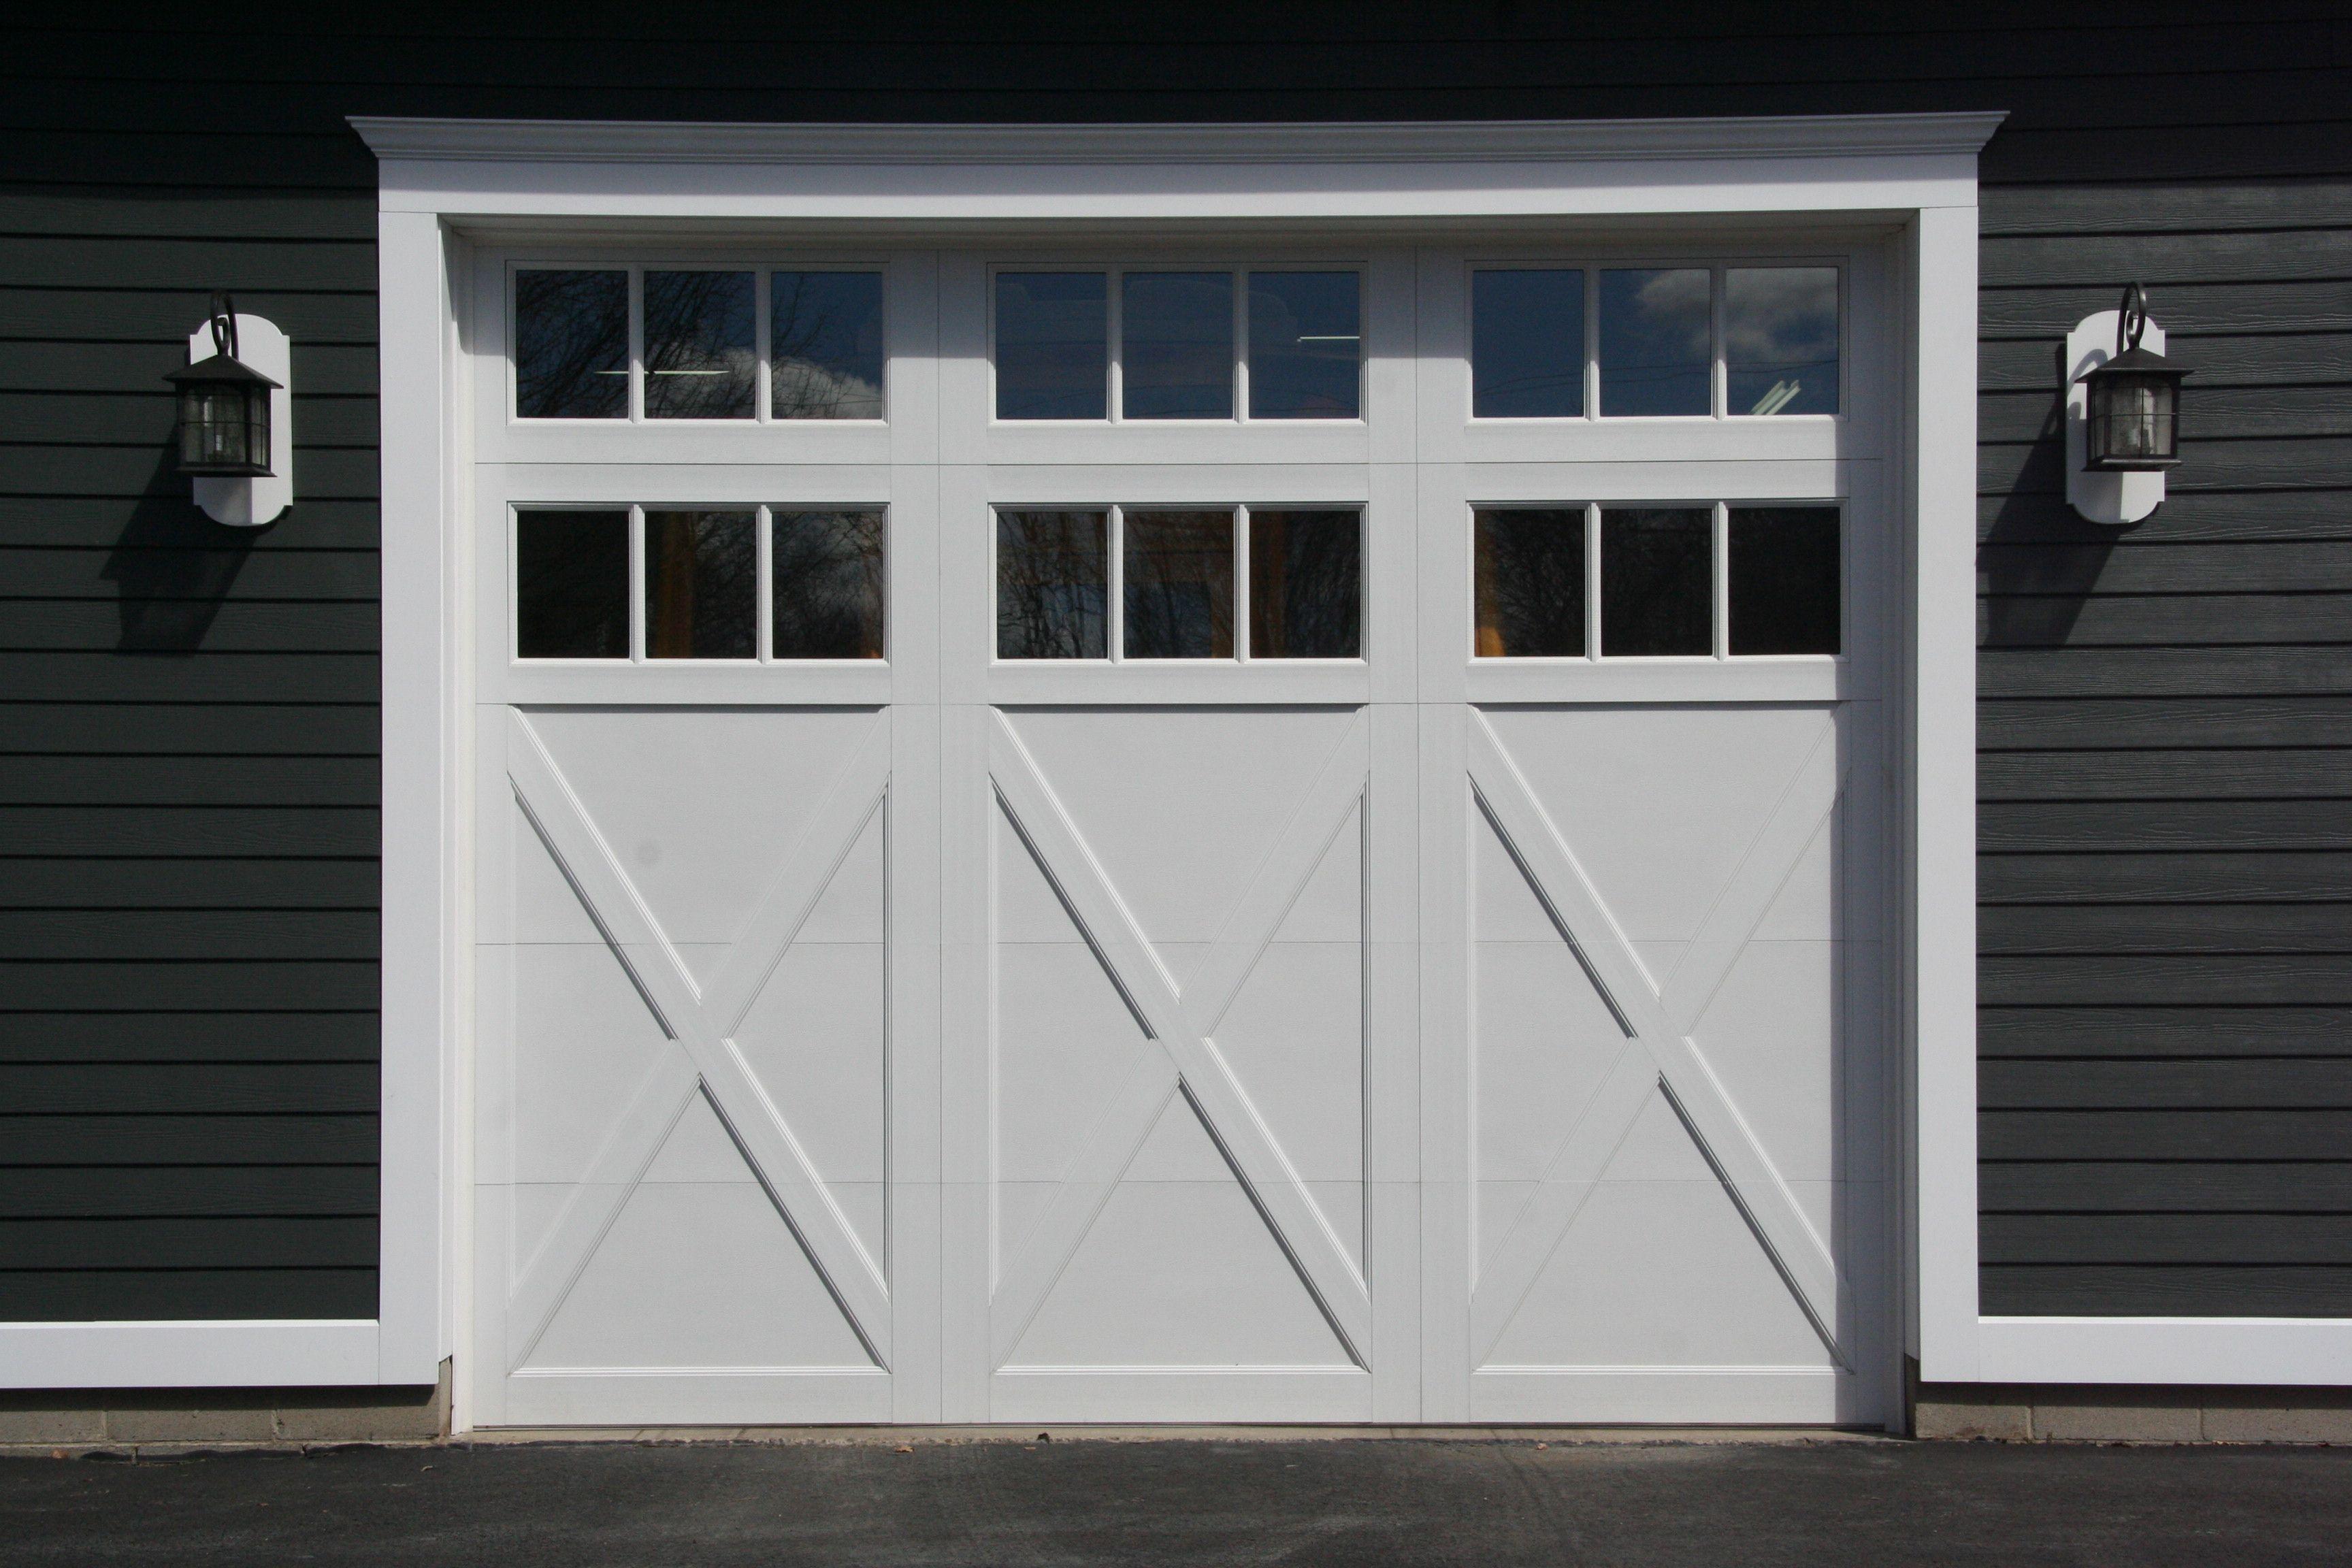 Raynor Garage Doors Rockcreeke Model With Two Rows Of Windows